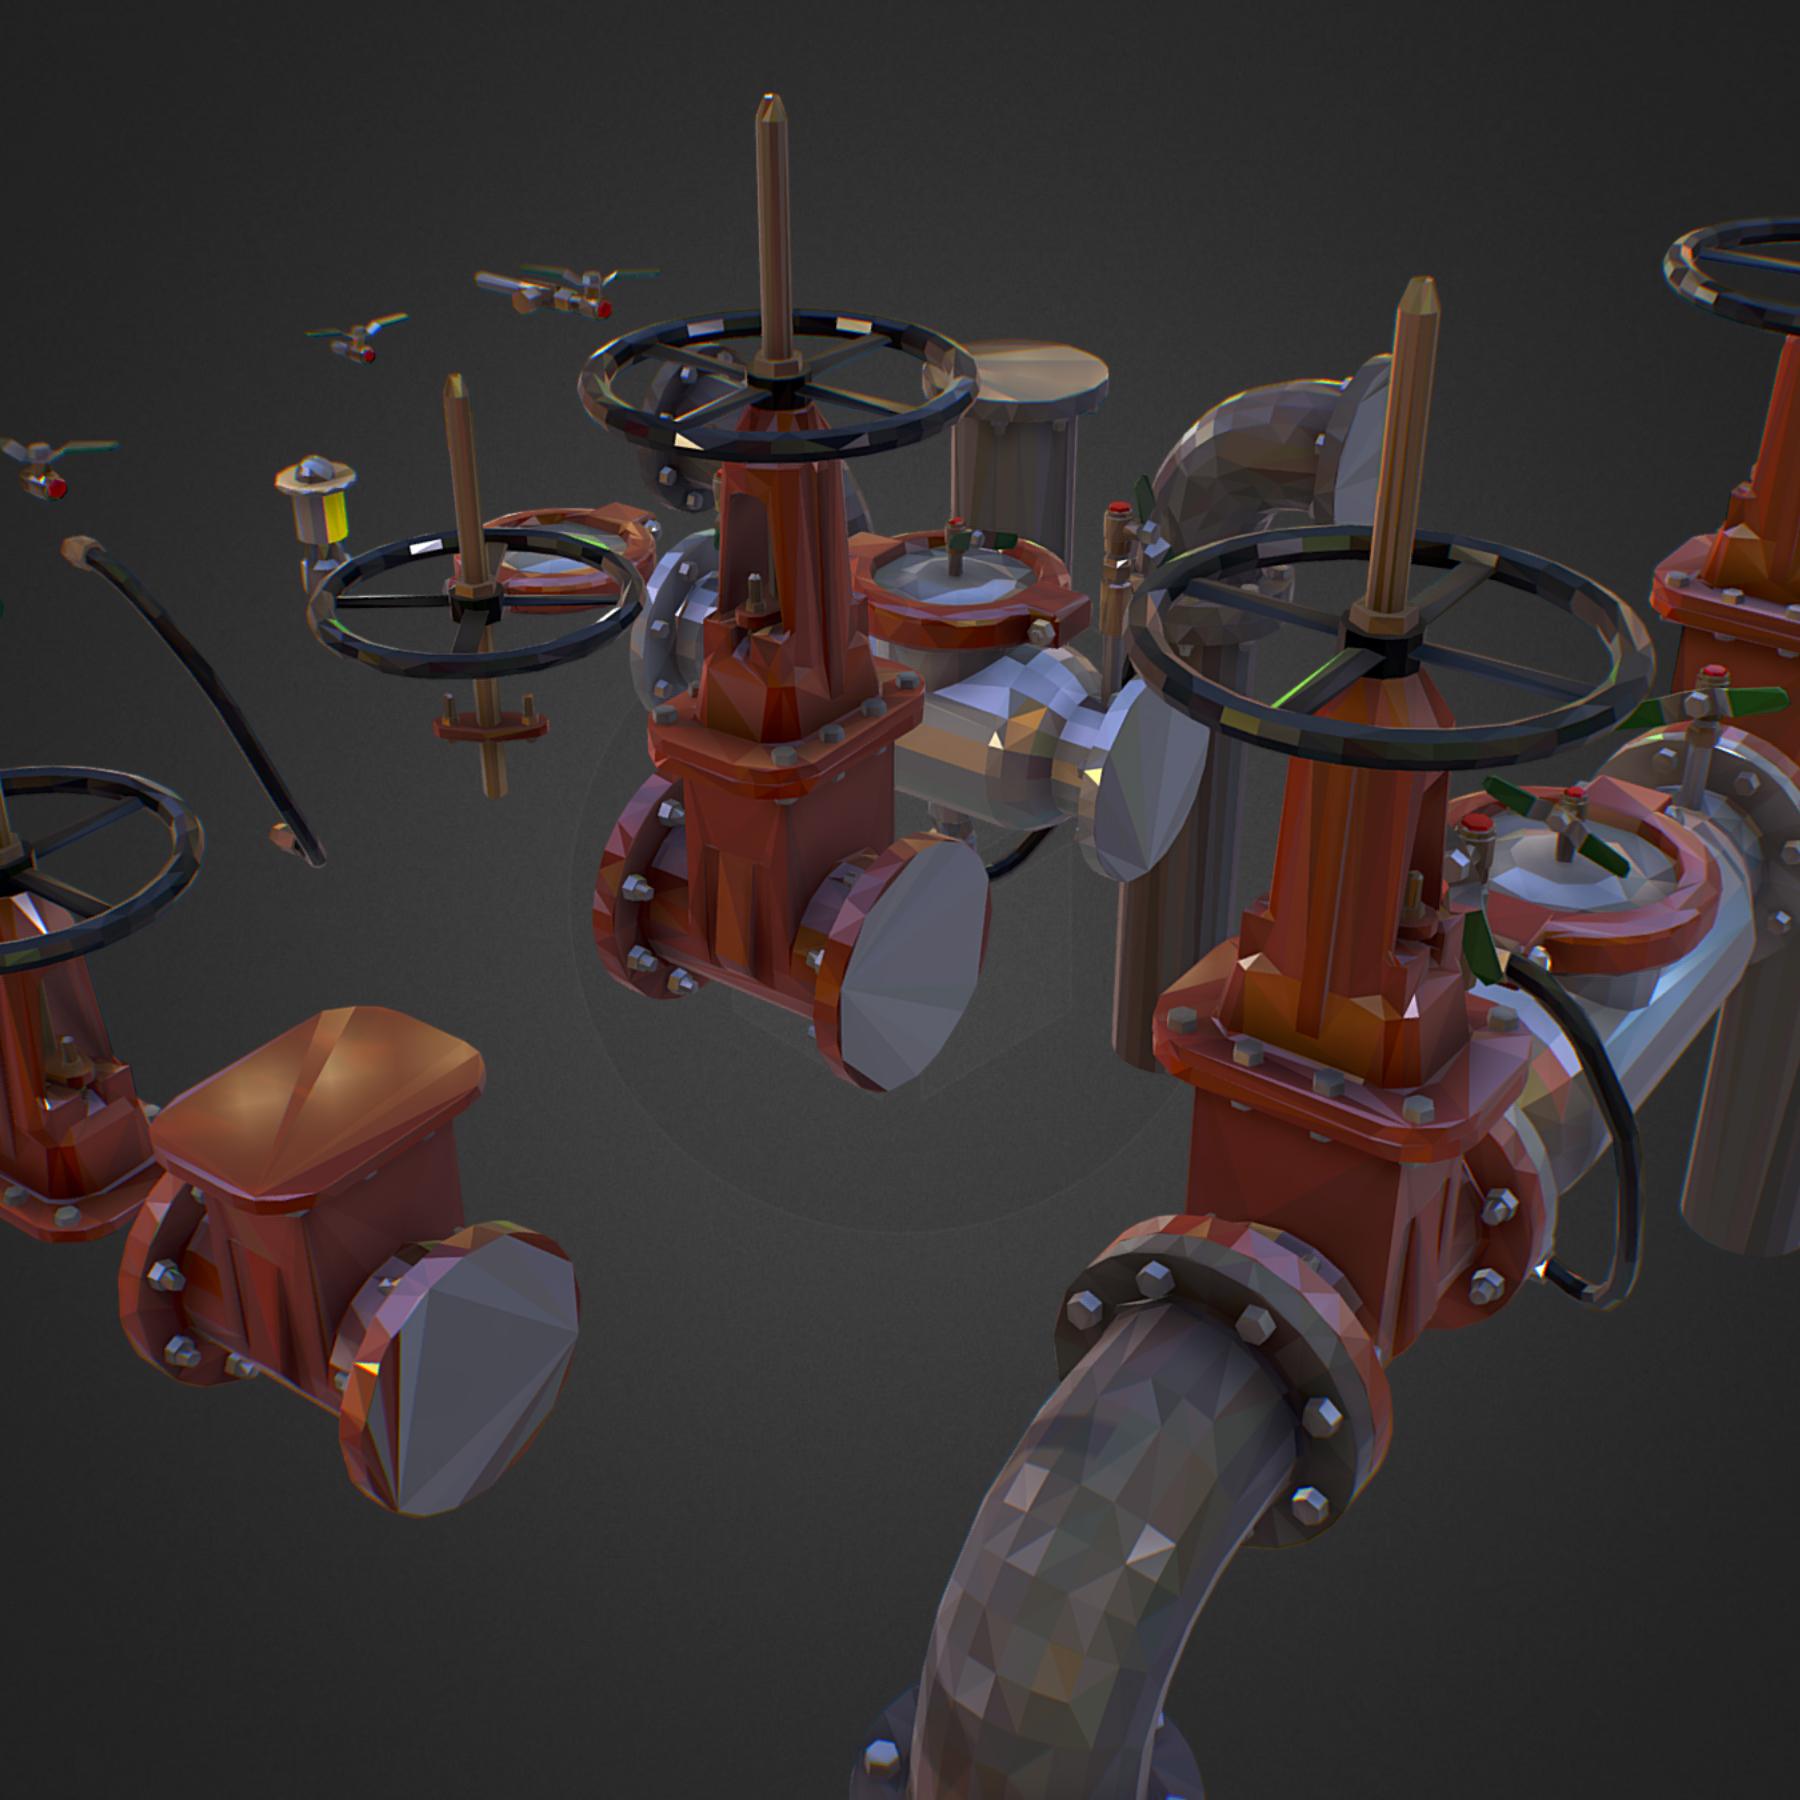 Low Poly ART Backflow Water Pipe Constructor 3d model max 3ds max plugin fbx ma mb tga targa icb vda vst pix obj 272543